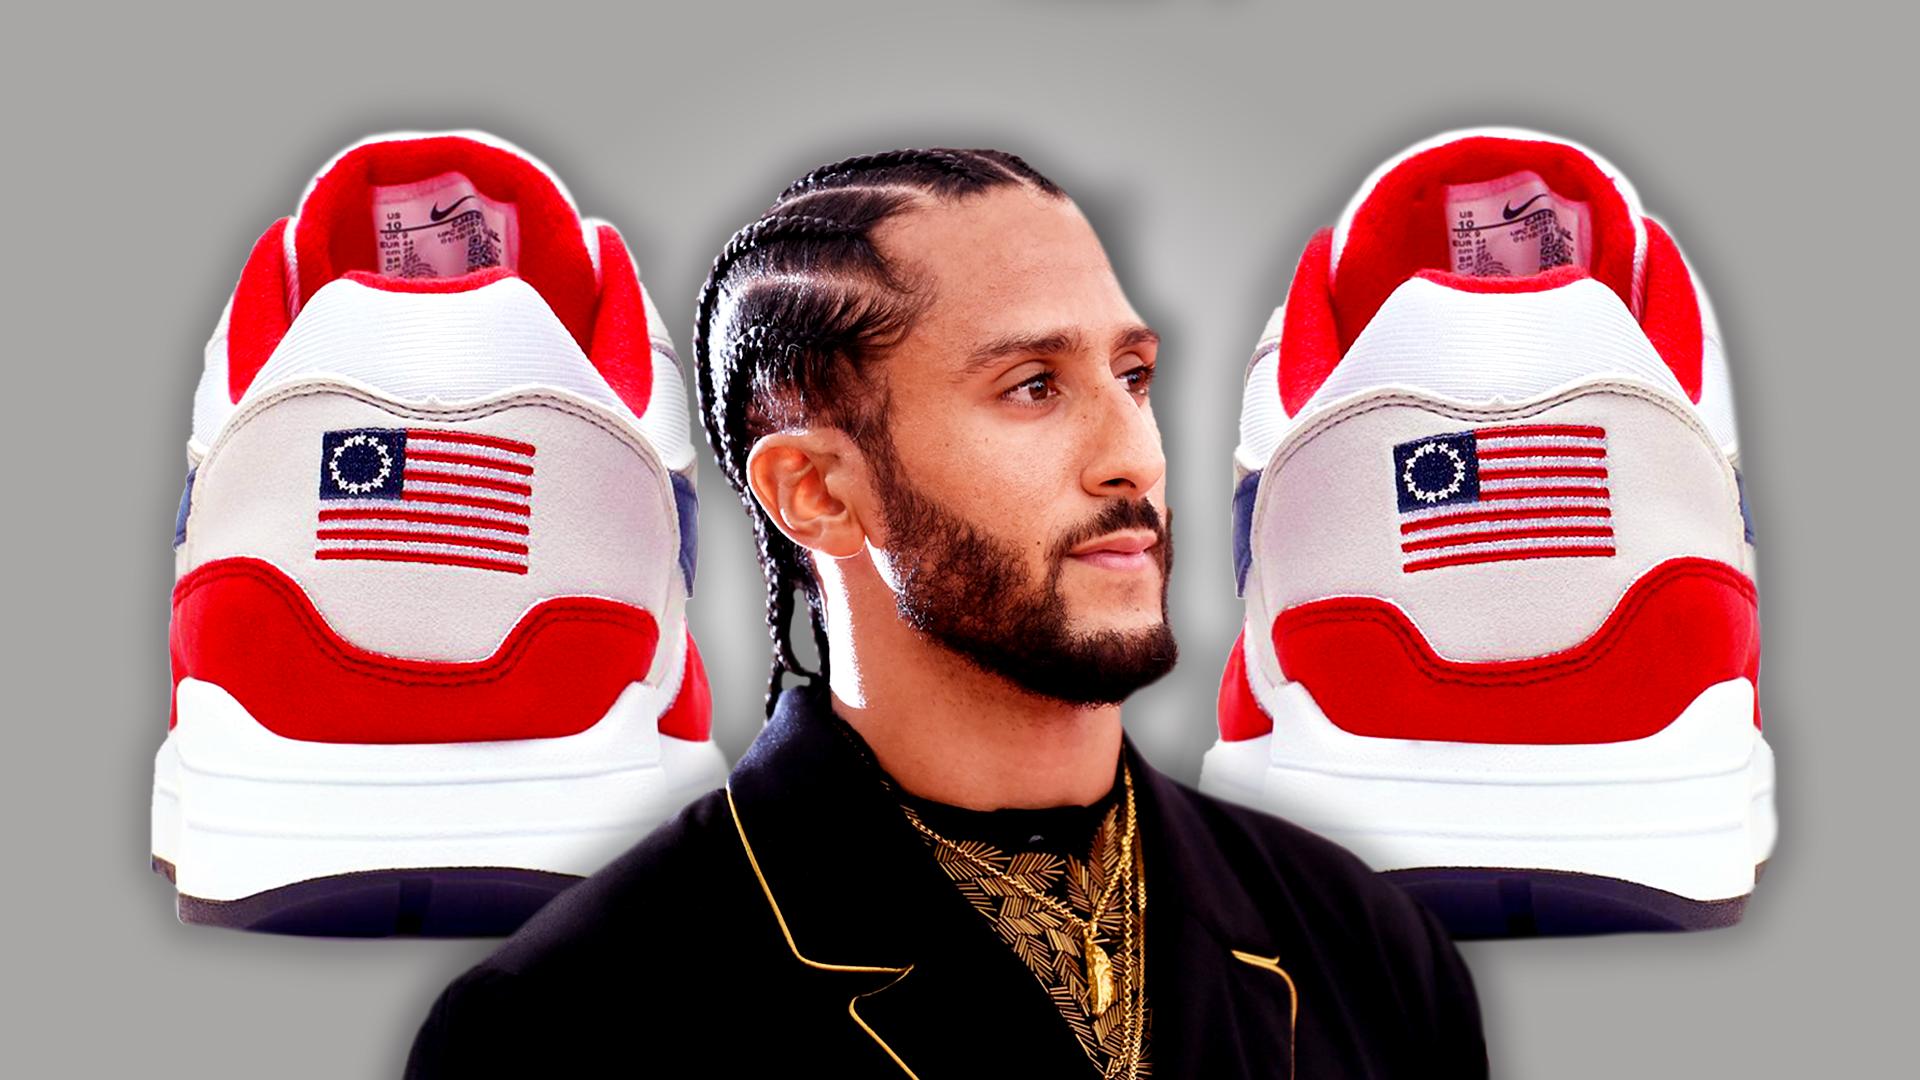 Colin Kaepernick Convinces Nike to Pull